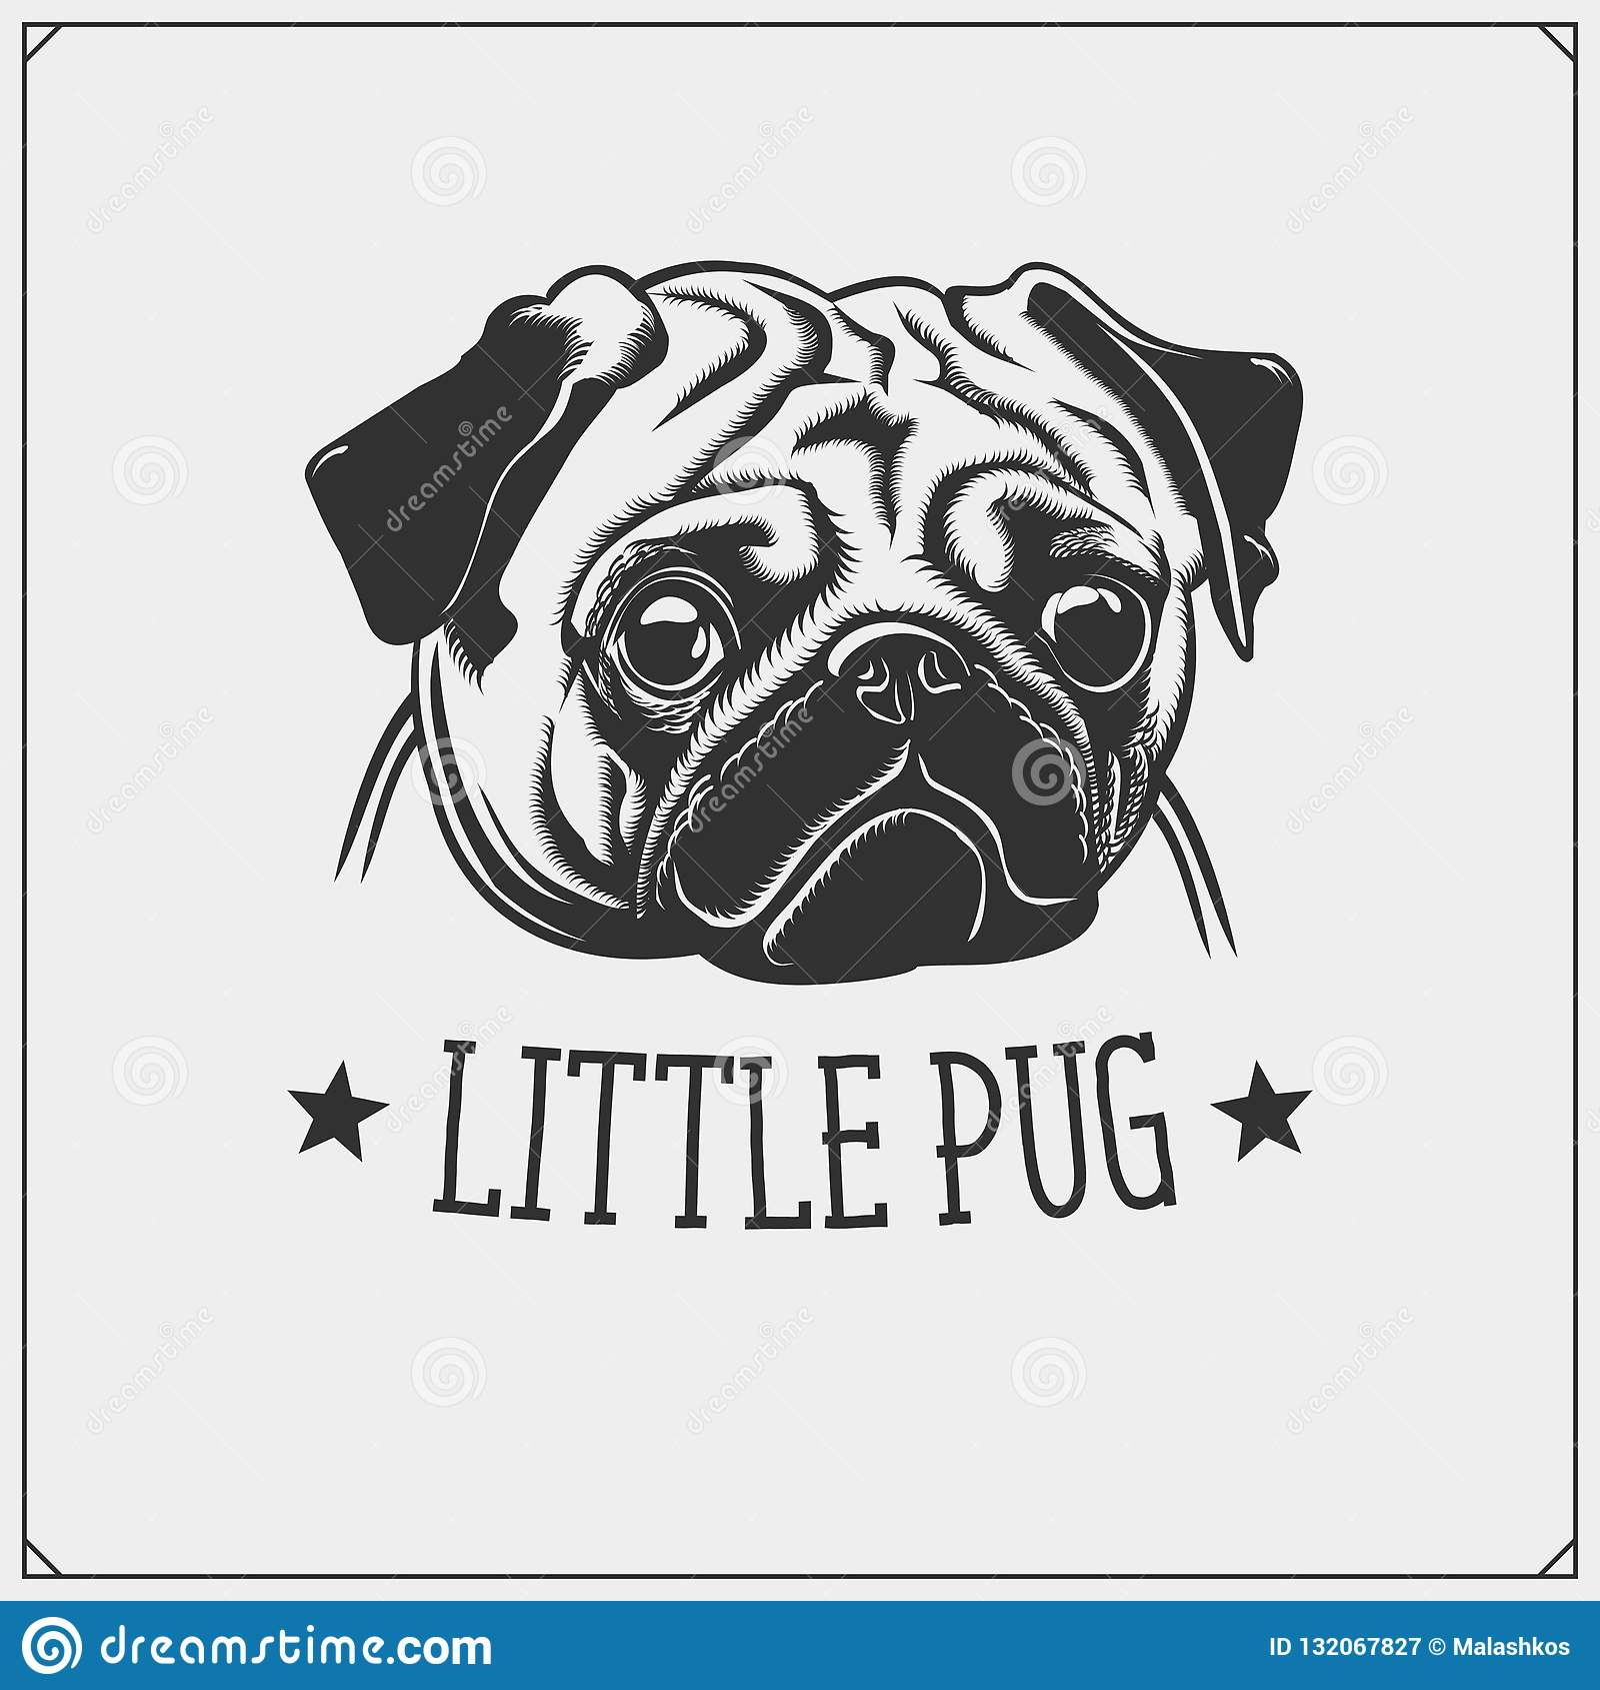 ca0392981ea3 Cute Pug dog portrait. Emblem for Pets Shop. Print design for t-shirts.